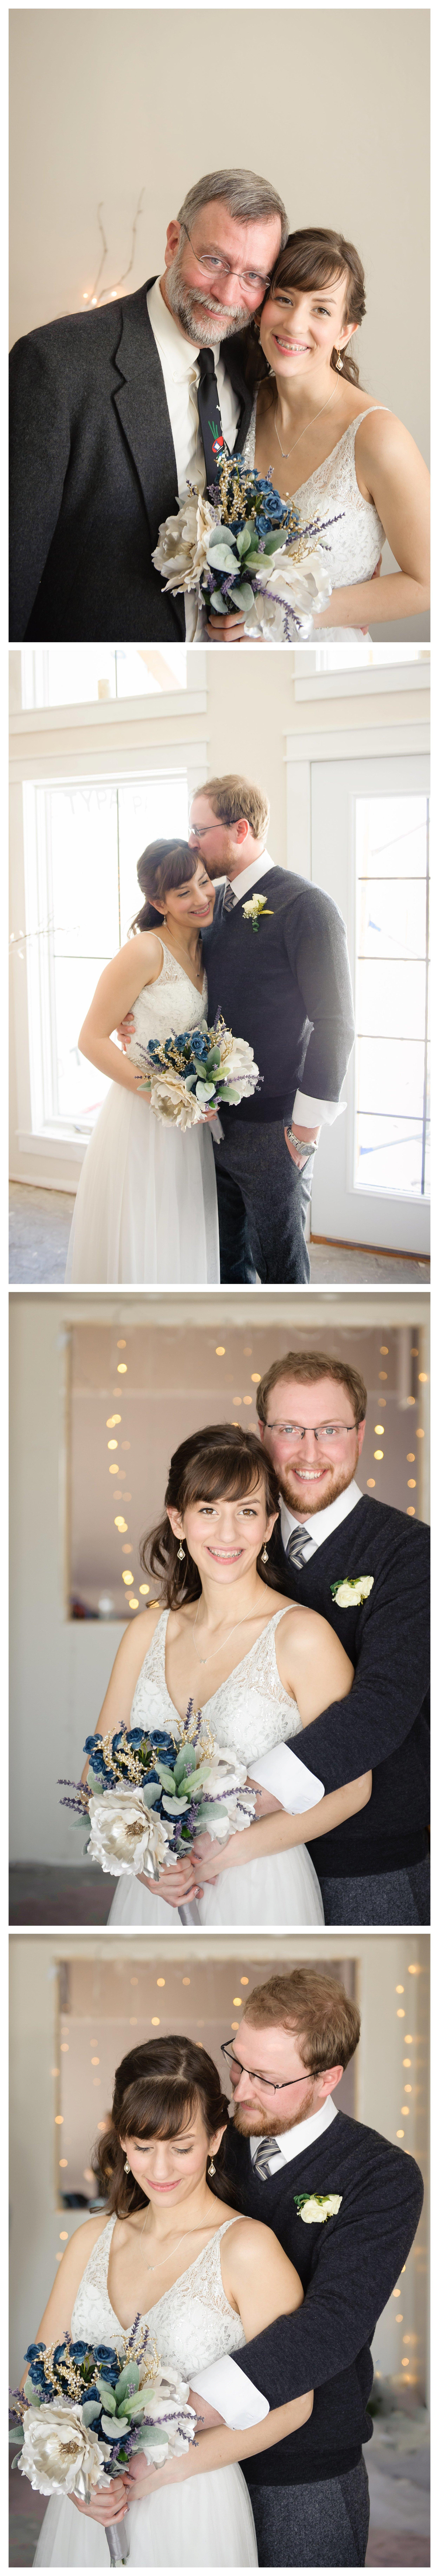 wisconsin wedding photographer timber baron inn bayfield wi ps 139 photography jen jensen_0213.jpg